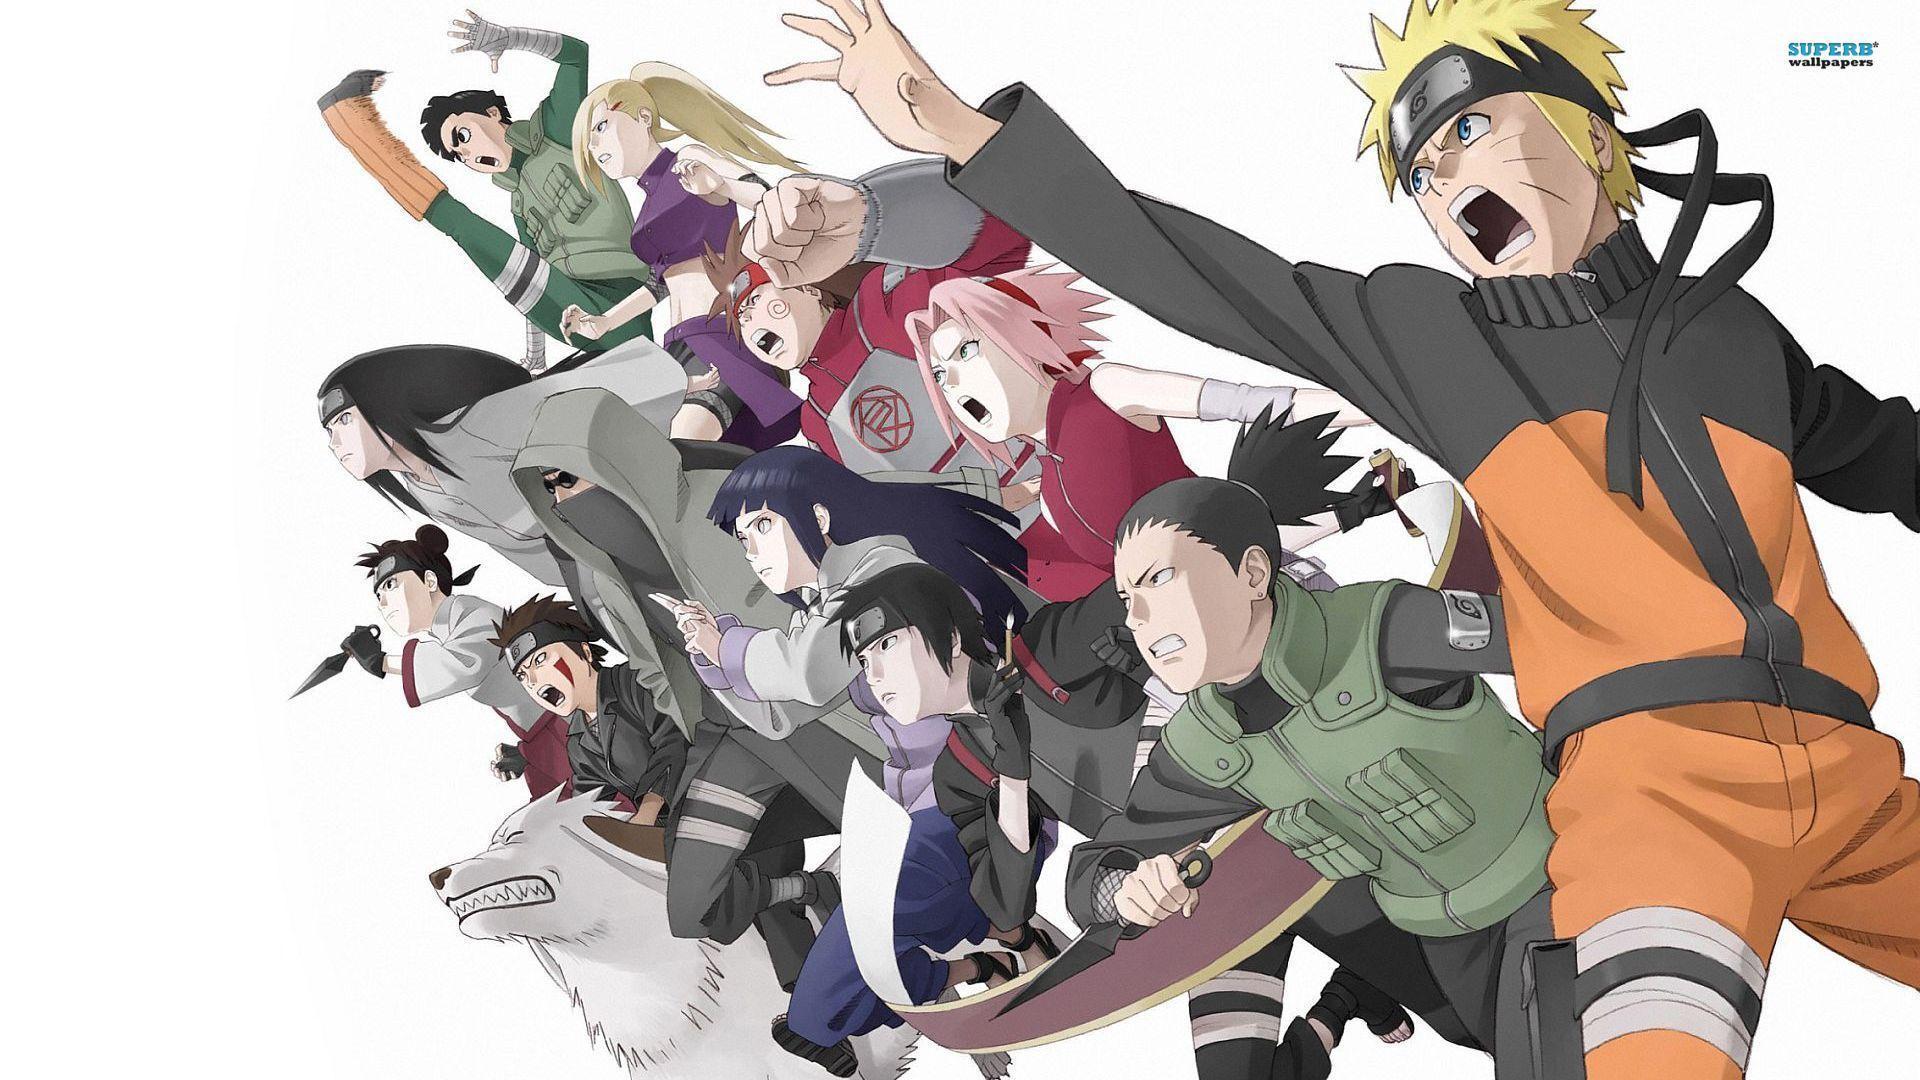 Cool Wallpaper Naruto Anime - RLBnztv  Perfect Image Reference_386018.jpg